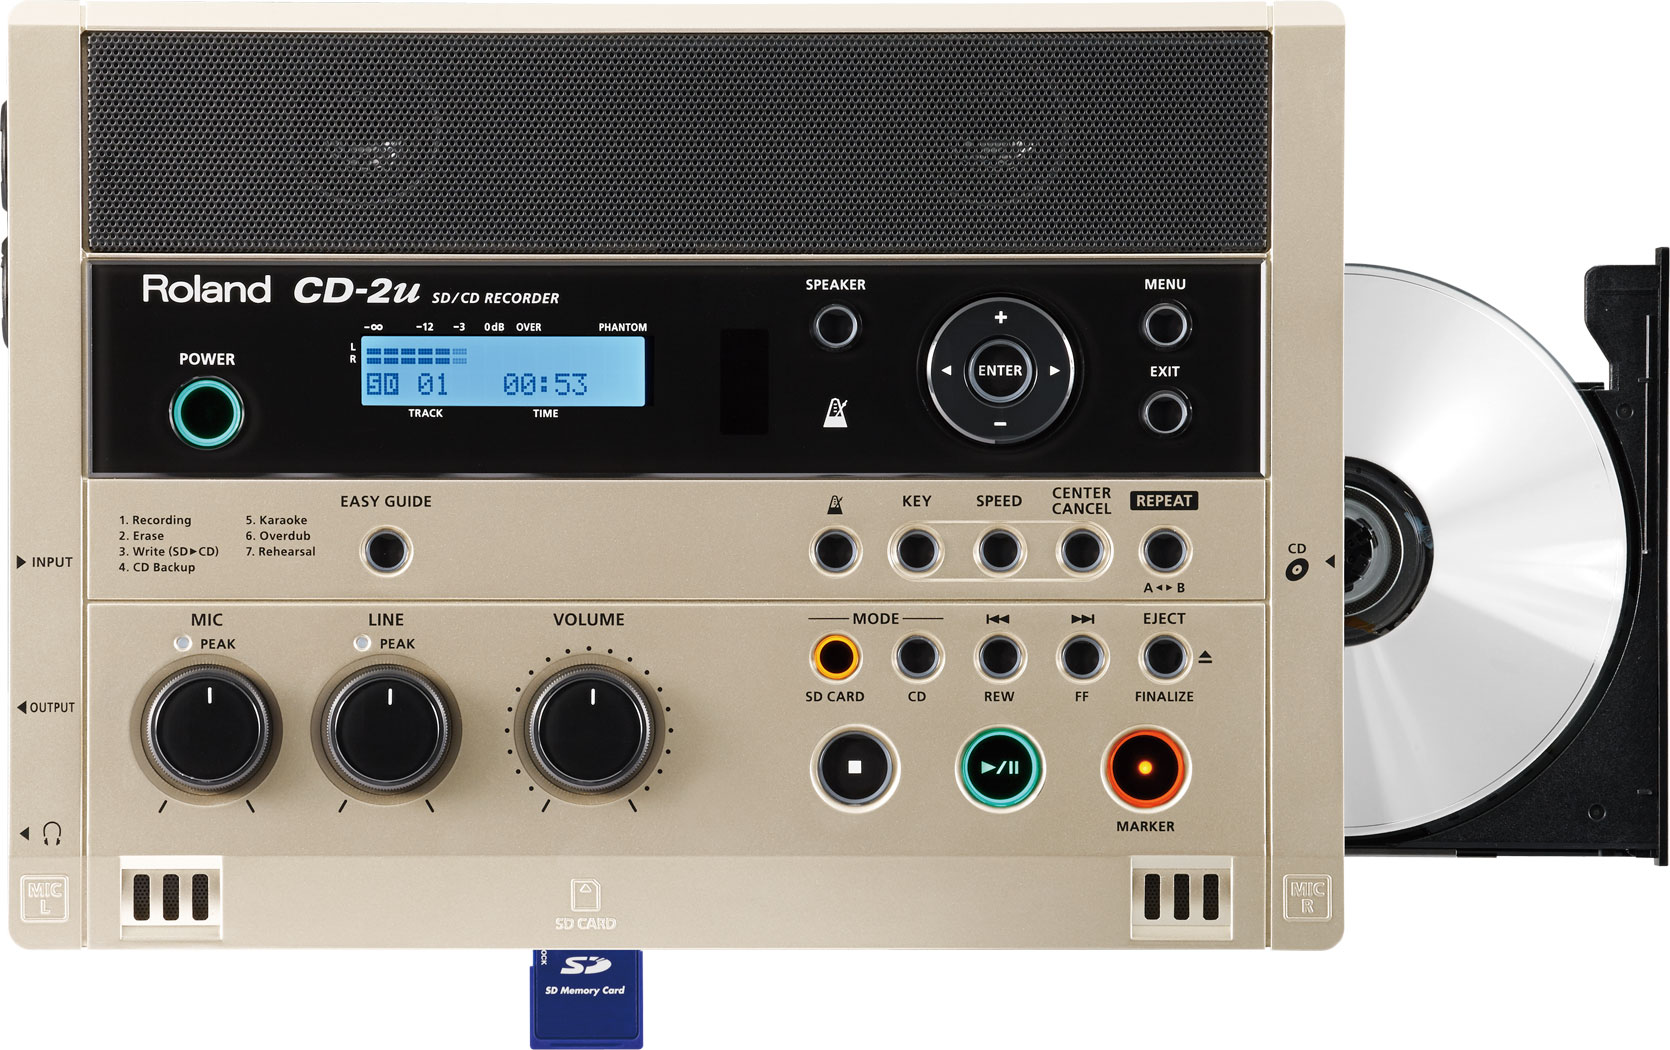 Roland CD-2u SD/CD portable recorder top